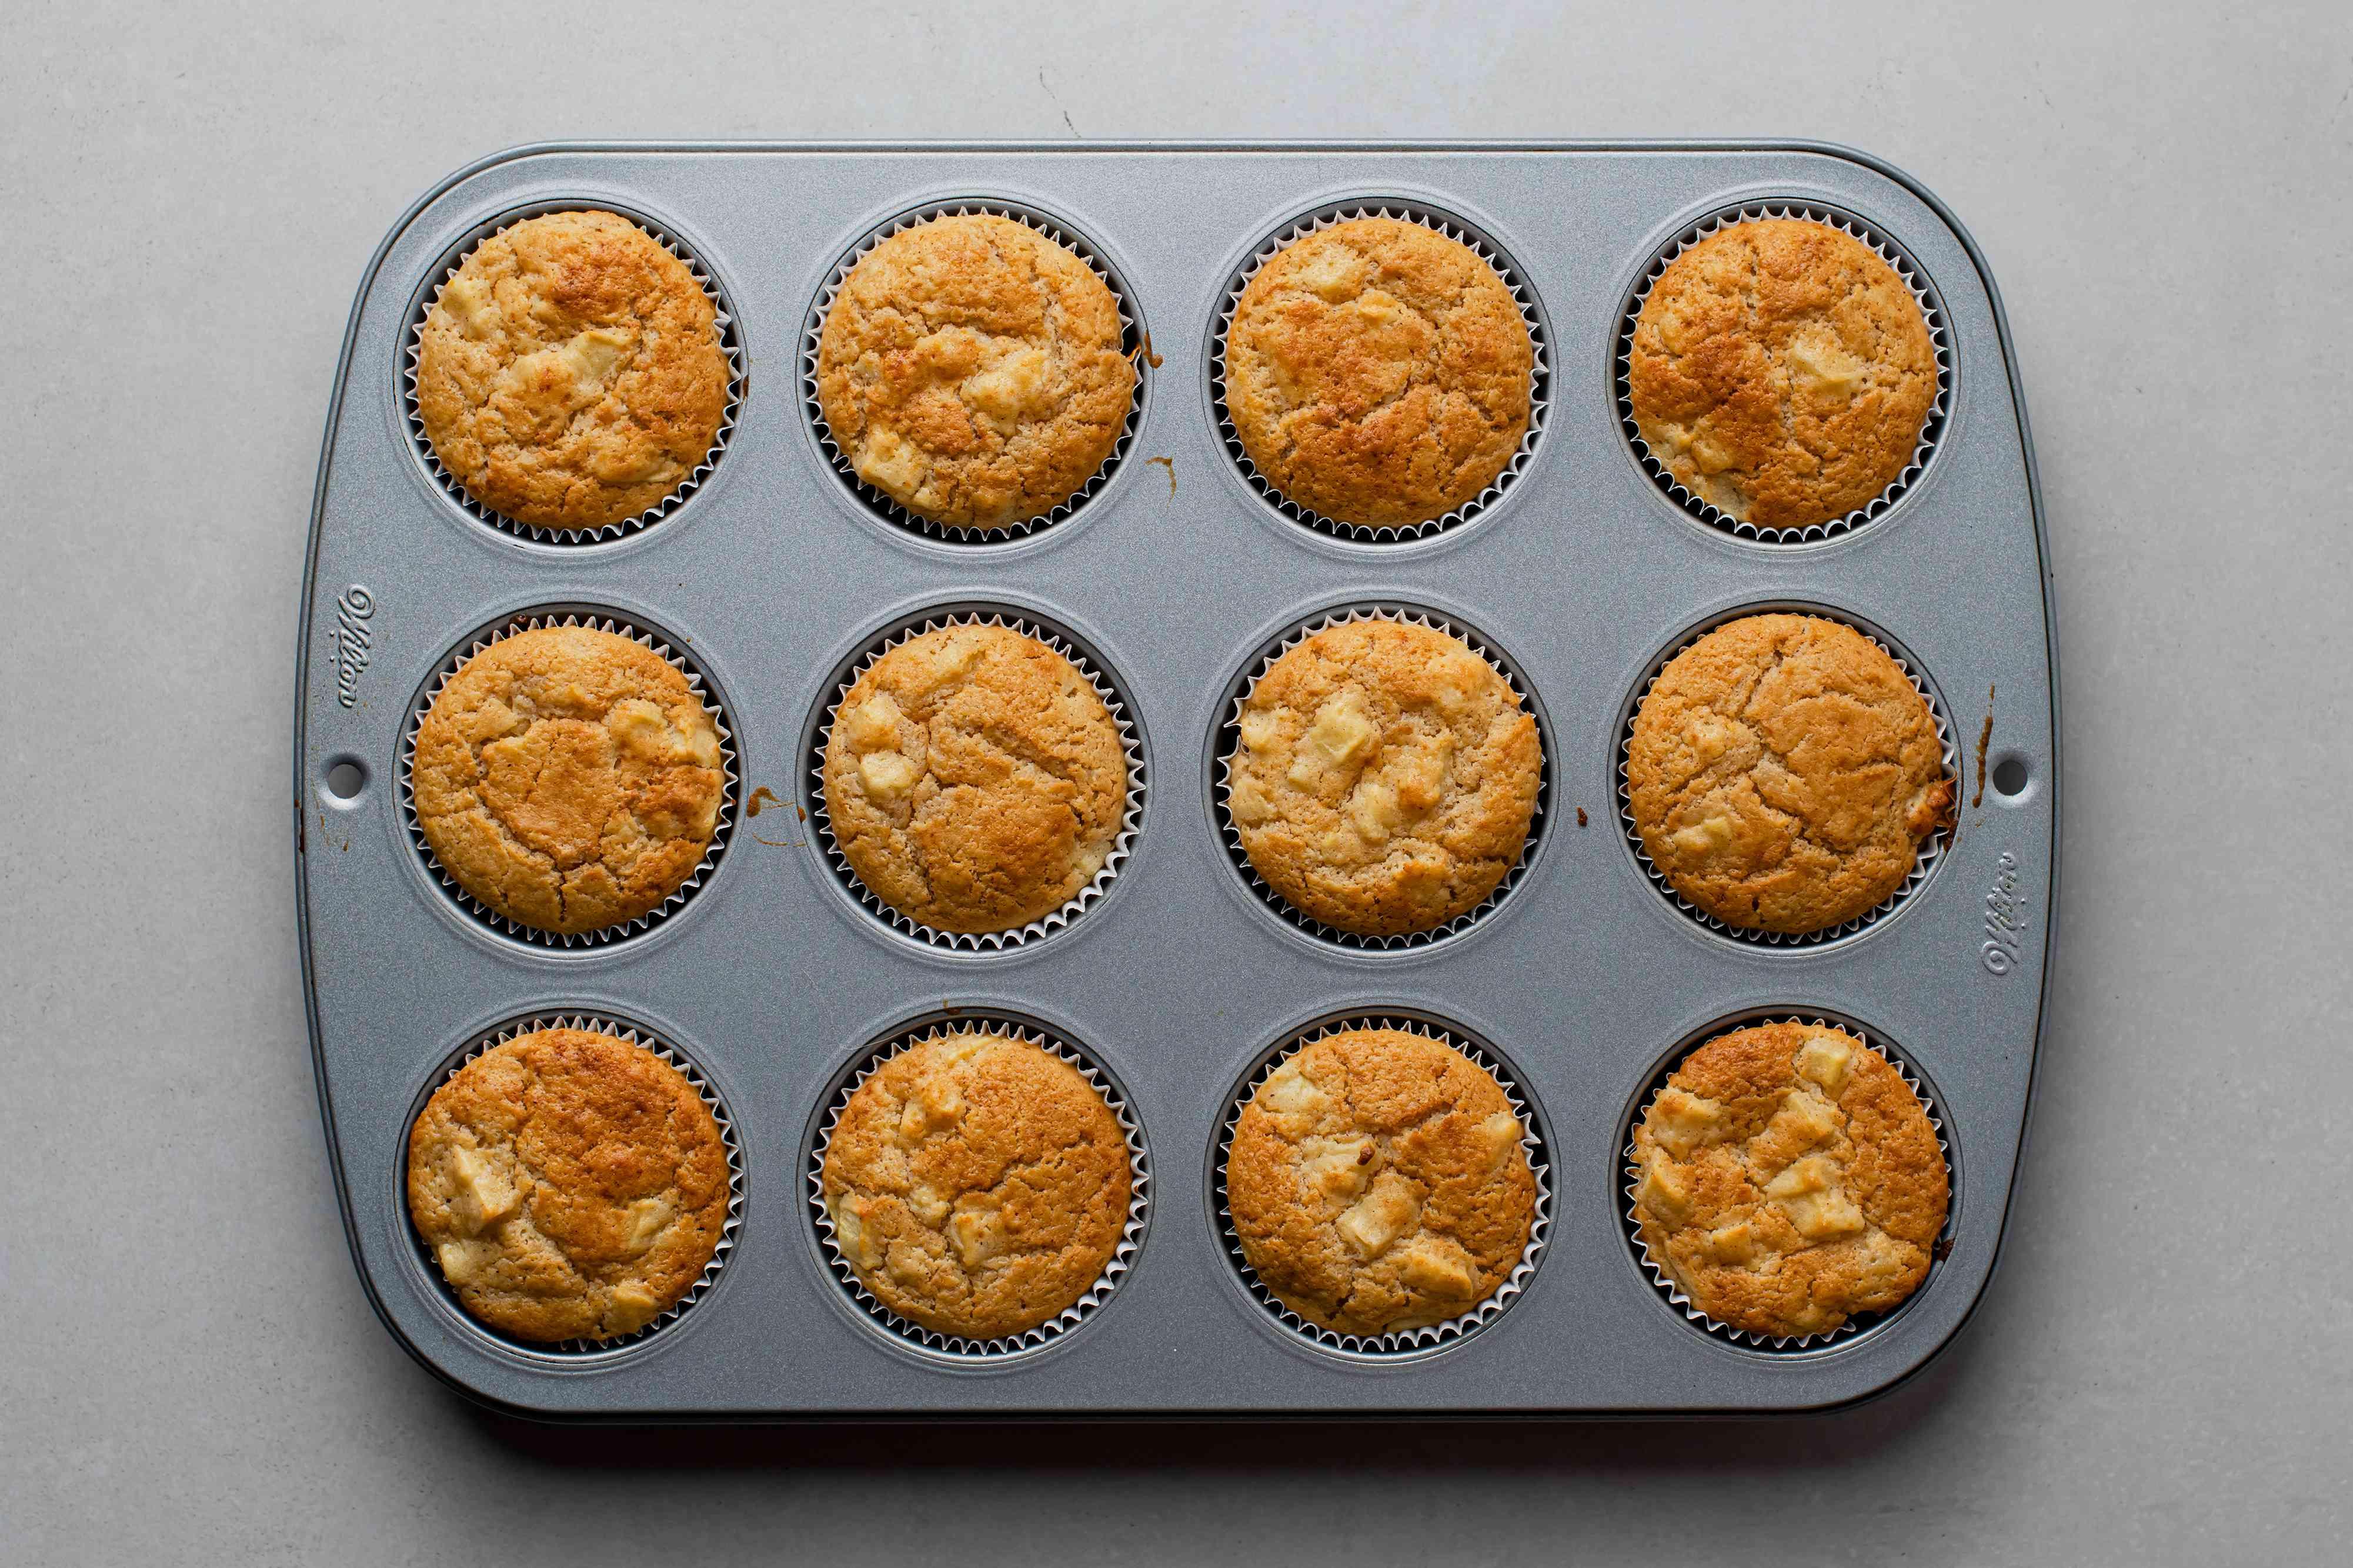 Apple Cinnamon Muffins in muffin tins